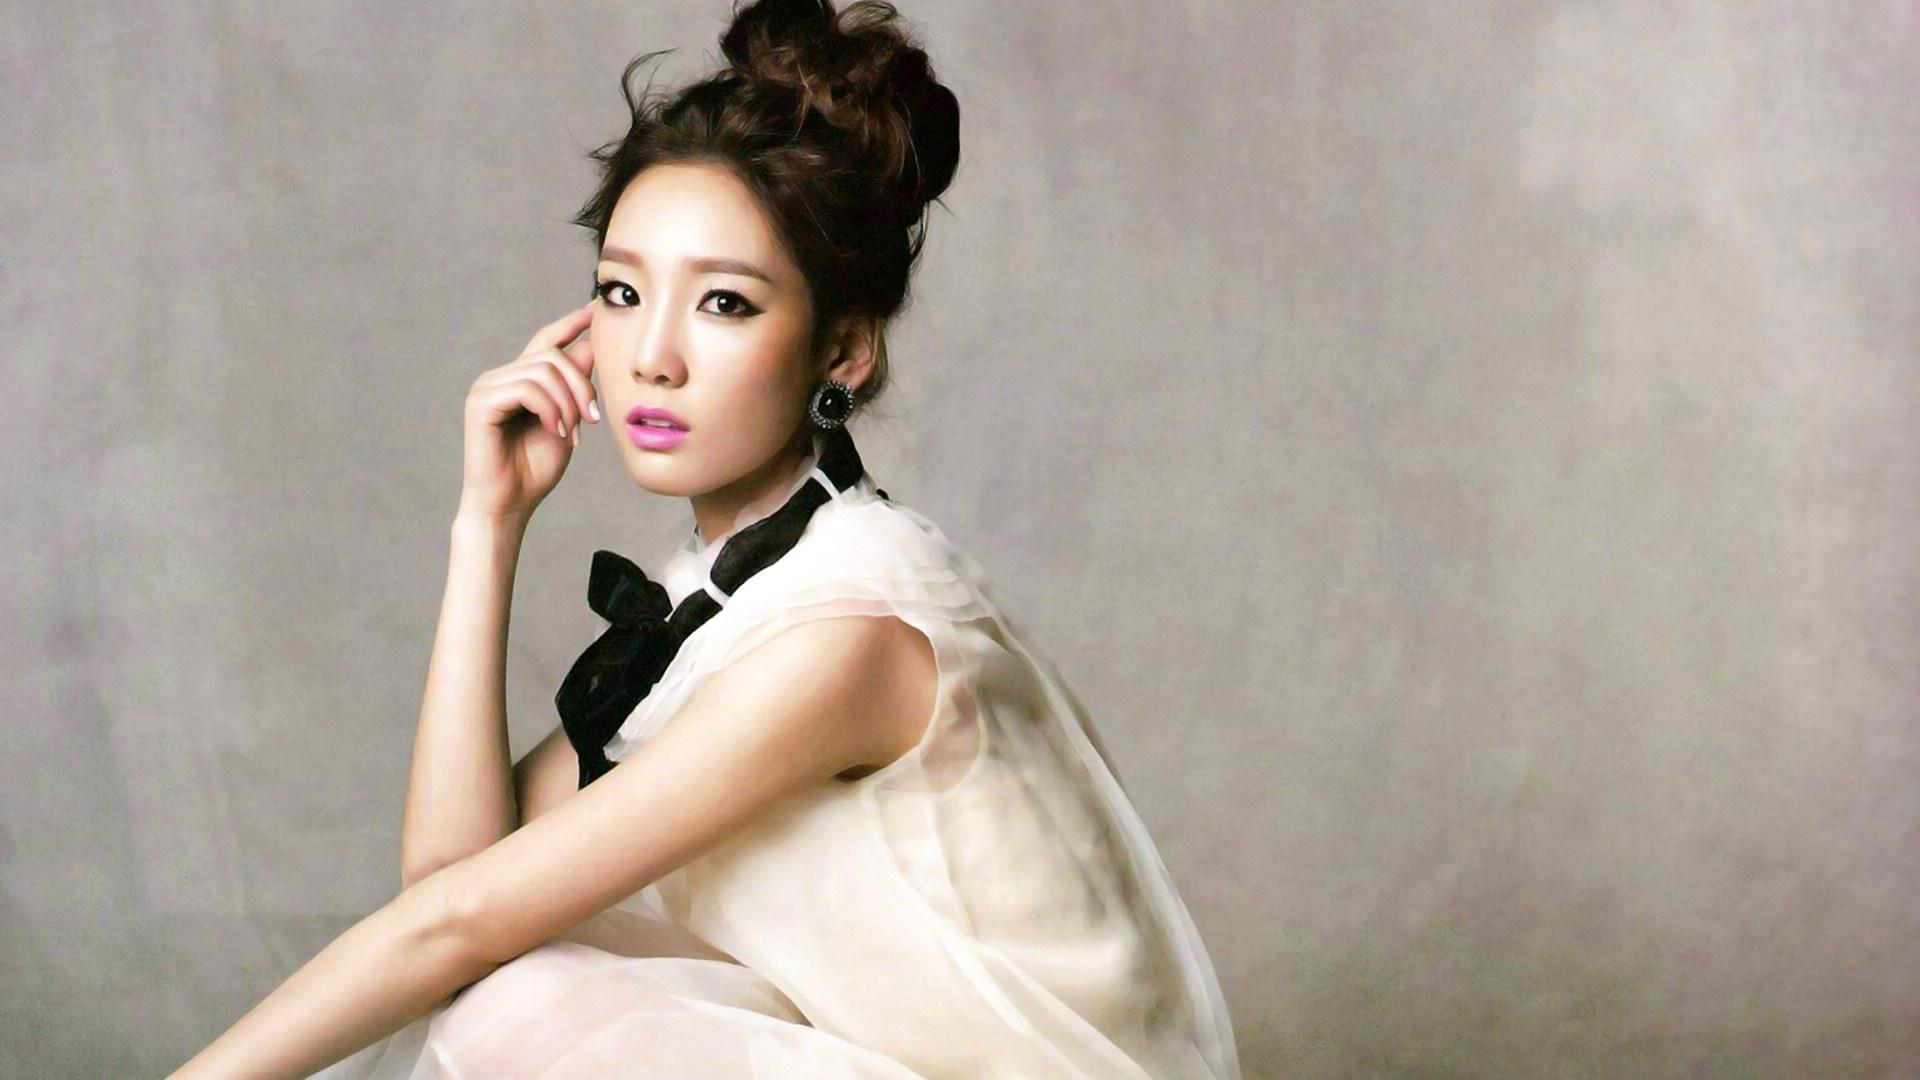 Taeyeon SNSD 2013 Taeyeon SNSD HD Wallpaper 1920x1080